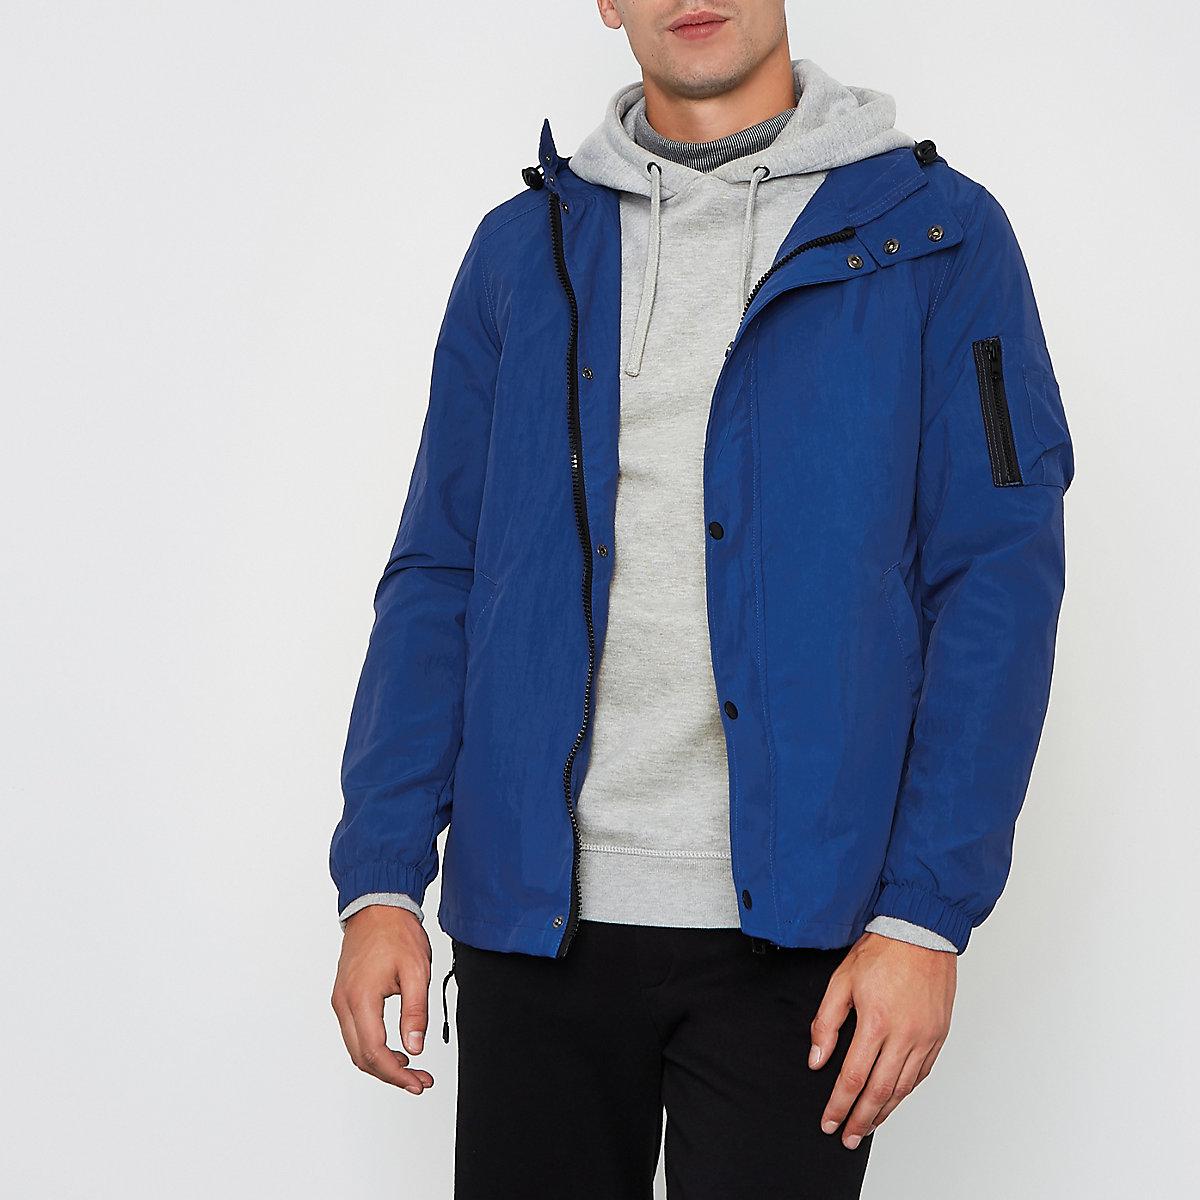 Blue hooded lightweight jacket